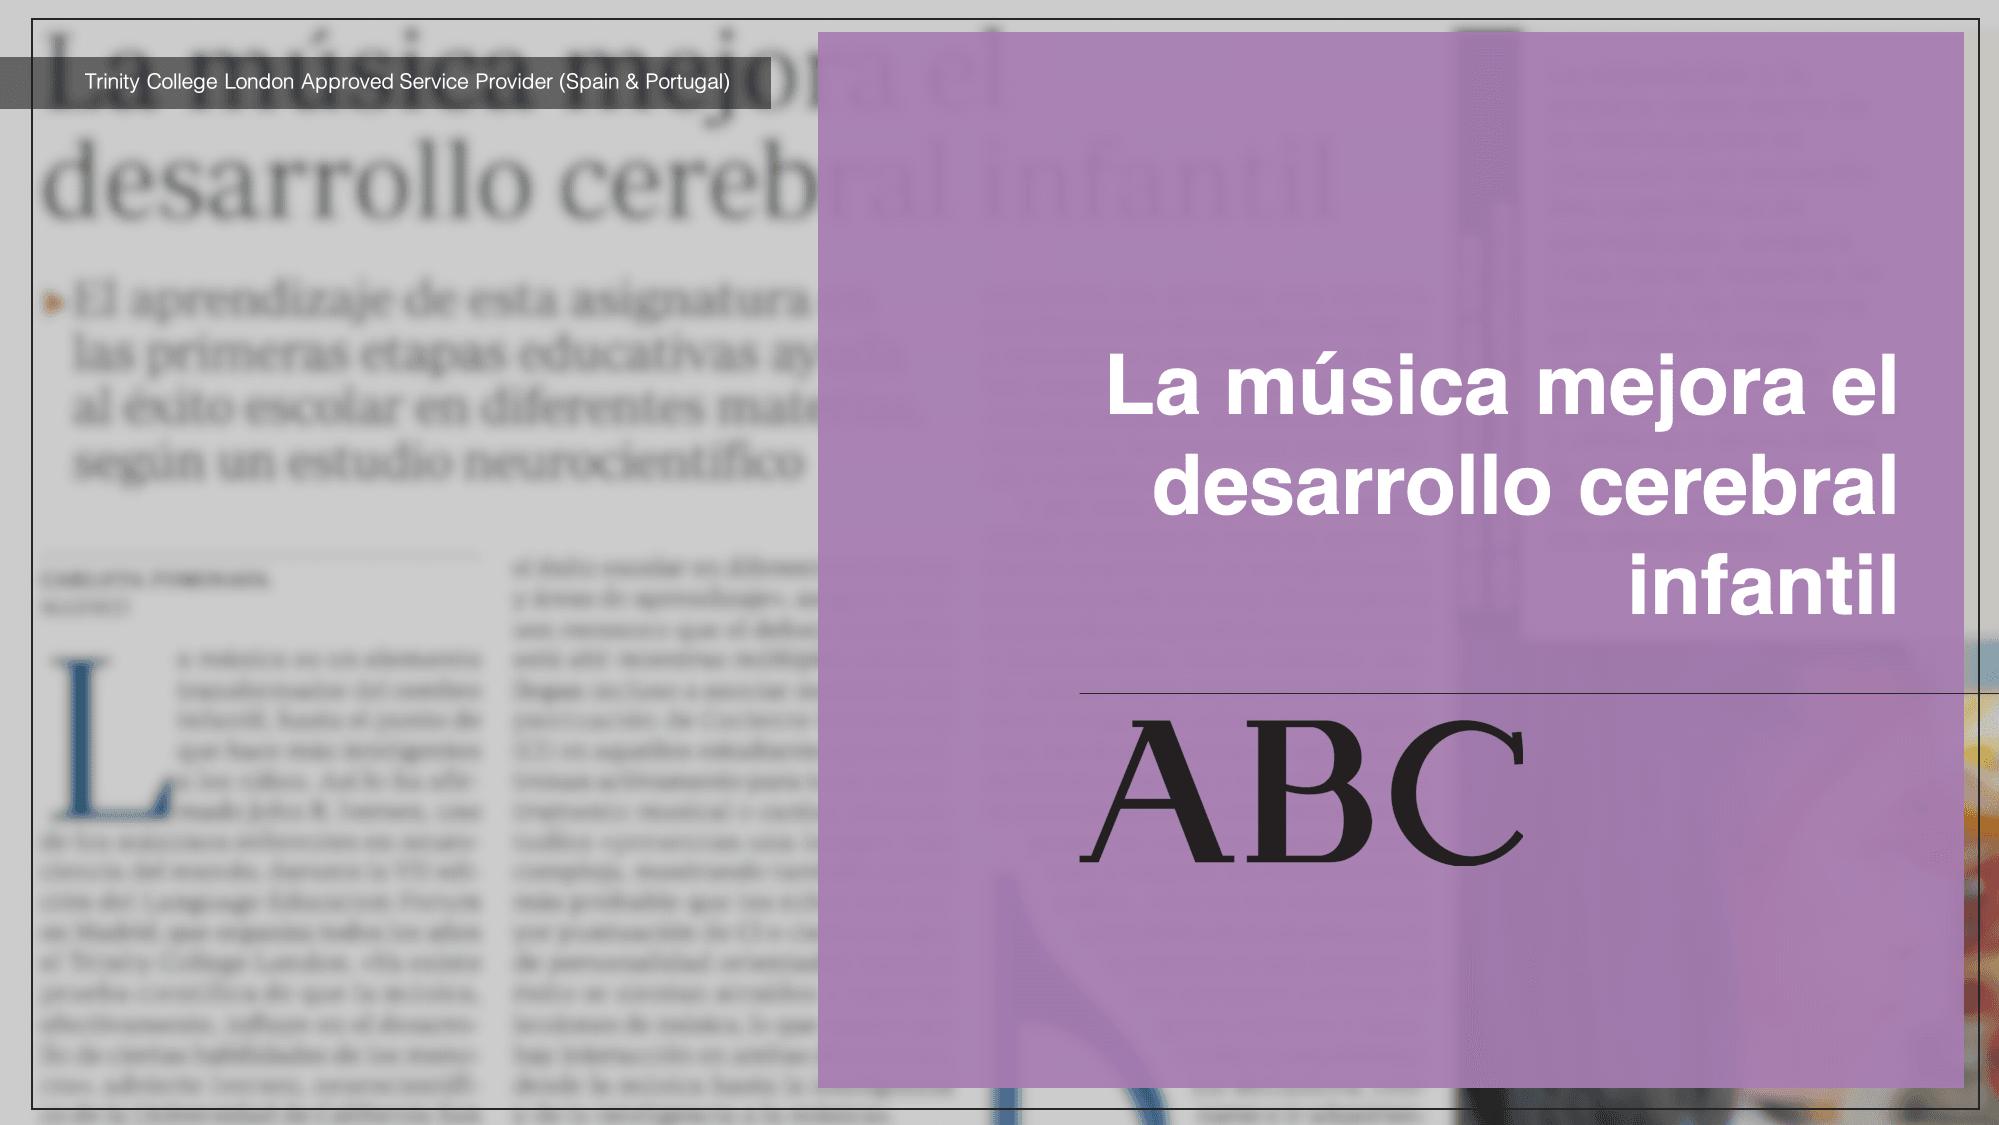 Articulo-ABC-Trinity-College-London-Spain